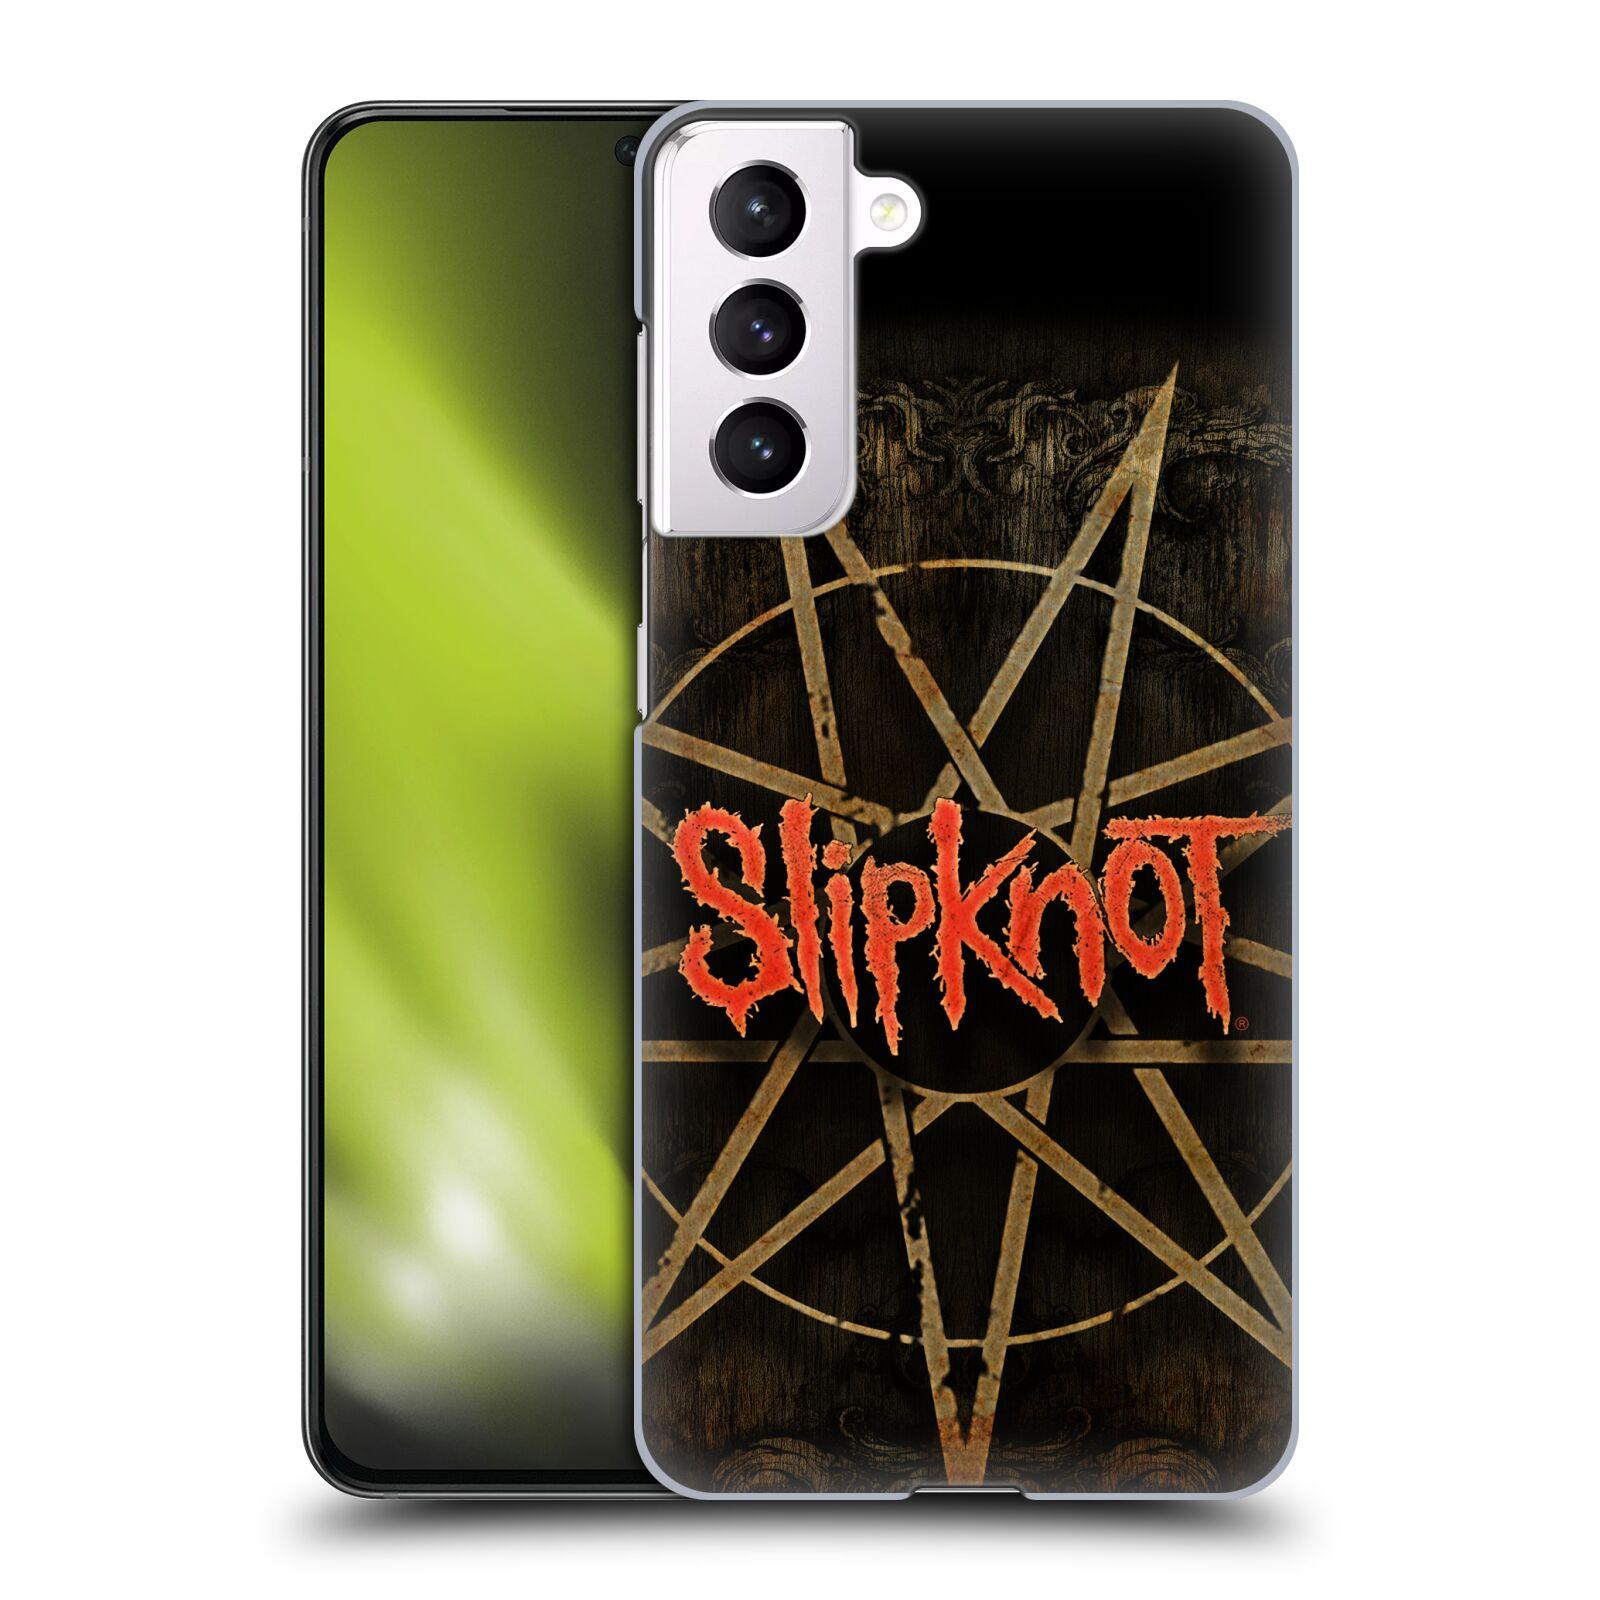 Plastové pouzdro na mobil Samsung Galaxy S21 5G - Head Case - Slipknot - Znak